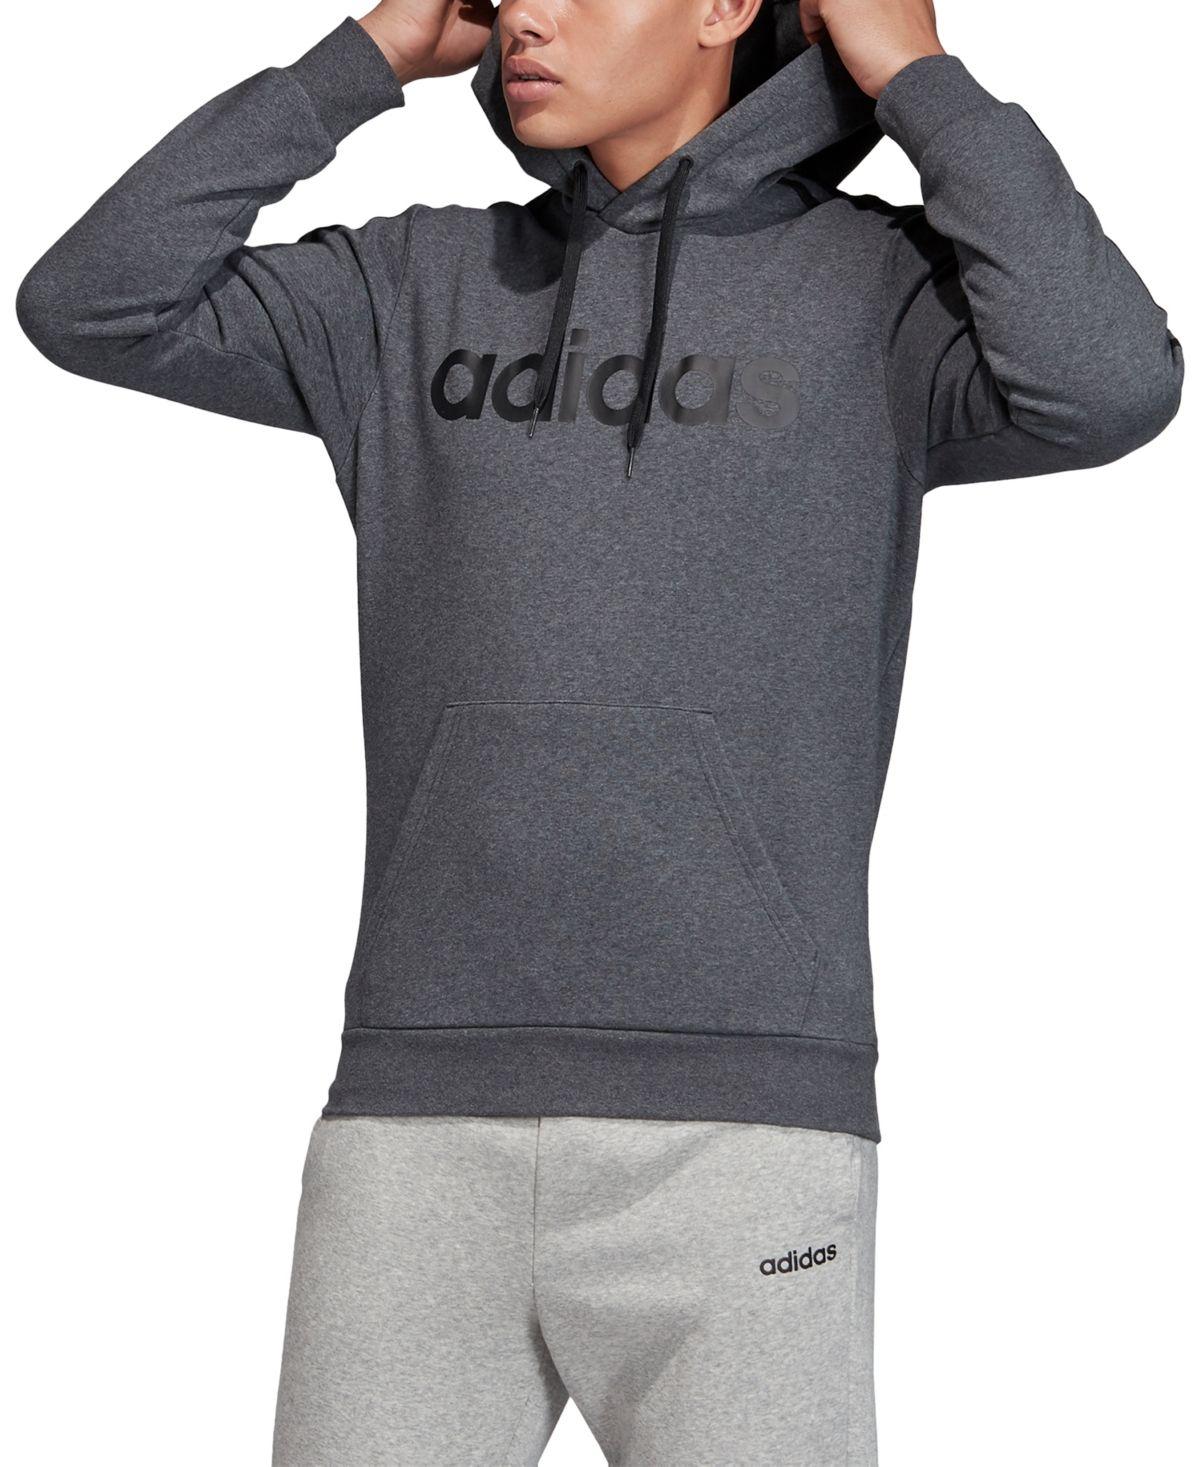 Adidas Men S Essentials 3 Stripes Fleece Logo Hoodie Reviews All Activewear Men Macy S In 2021 Sporty Outfits For Men Hoodie Outfit Men Adidas Men [ 1467 x 1200 Pixel ]